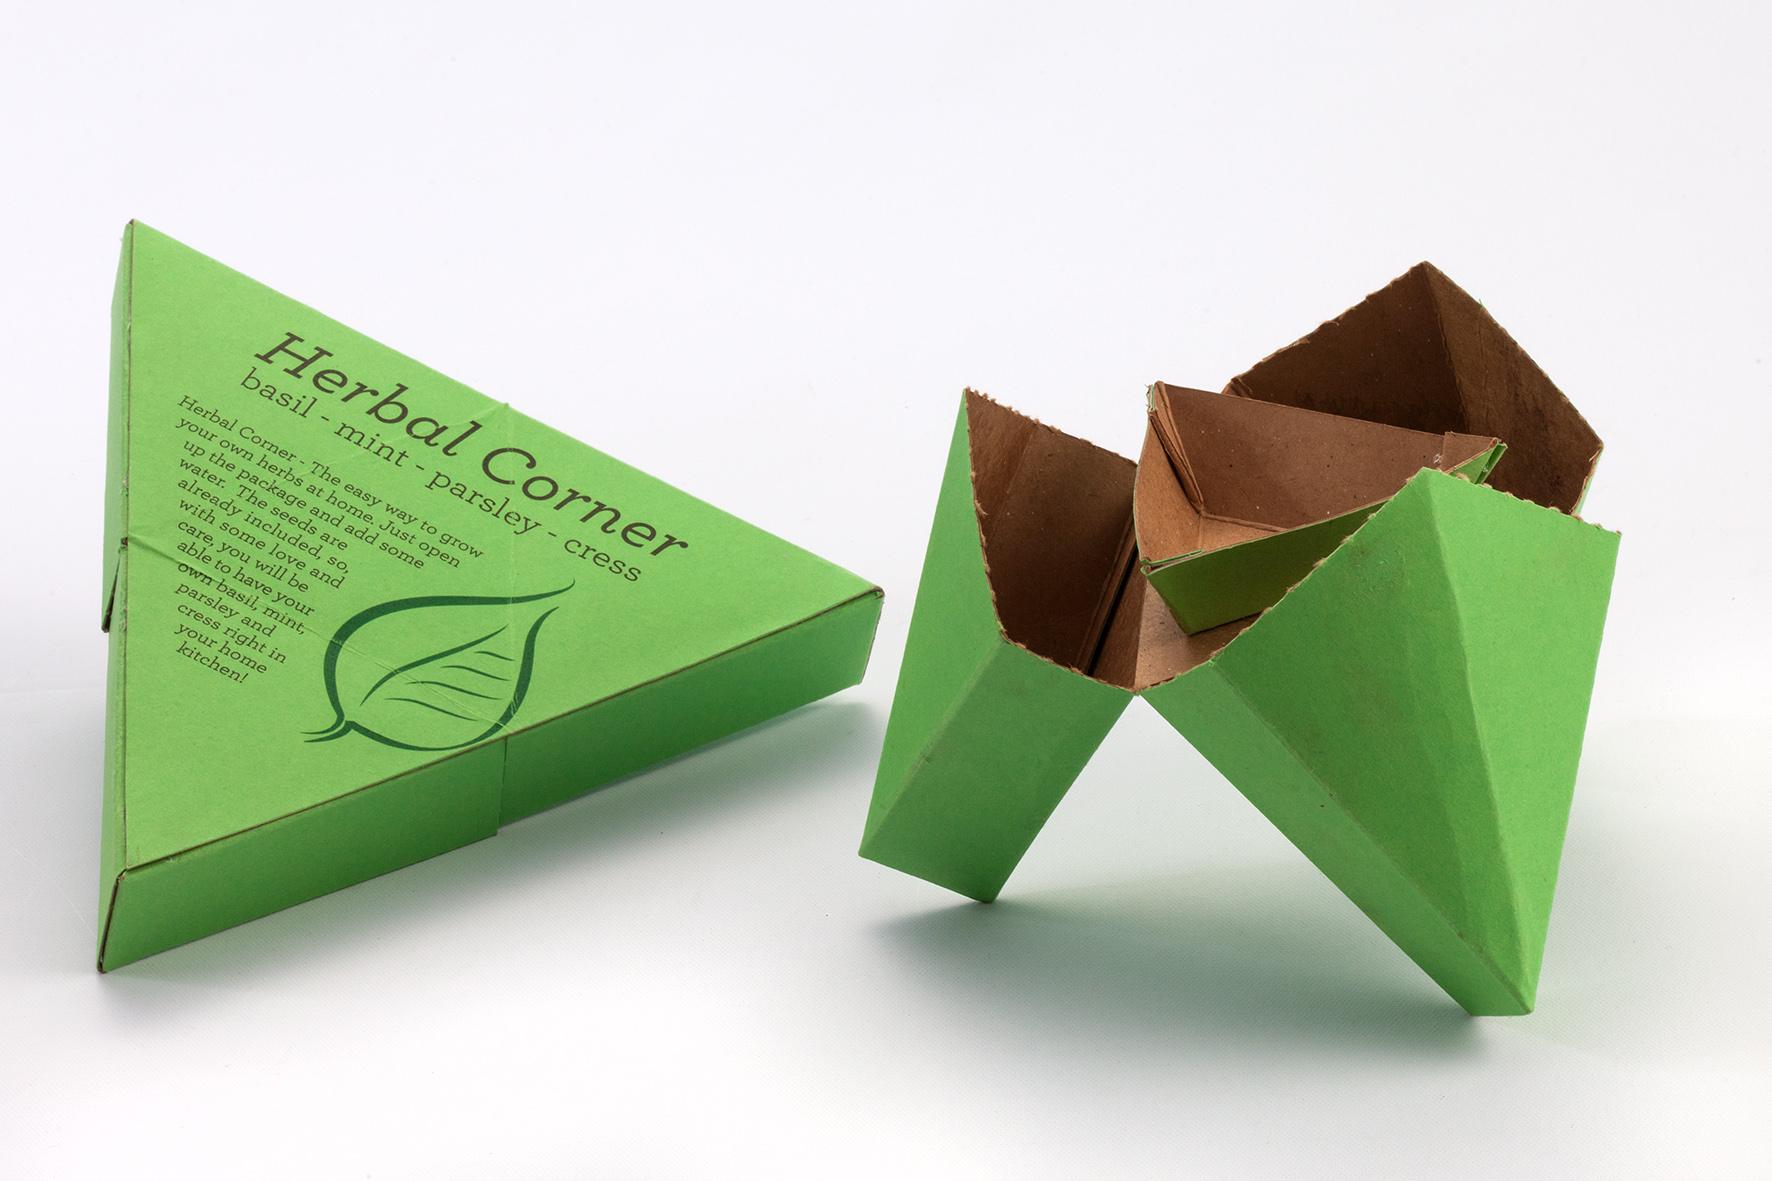 carton-award-image 129751